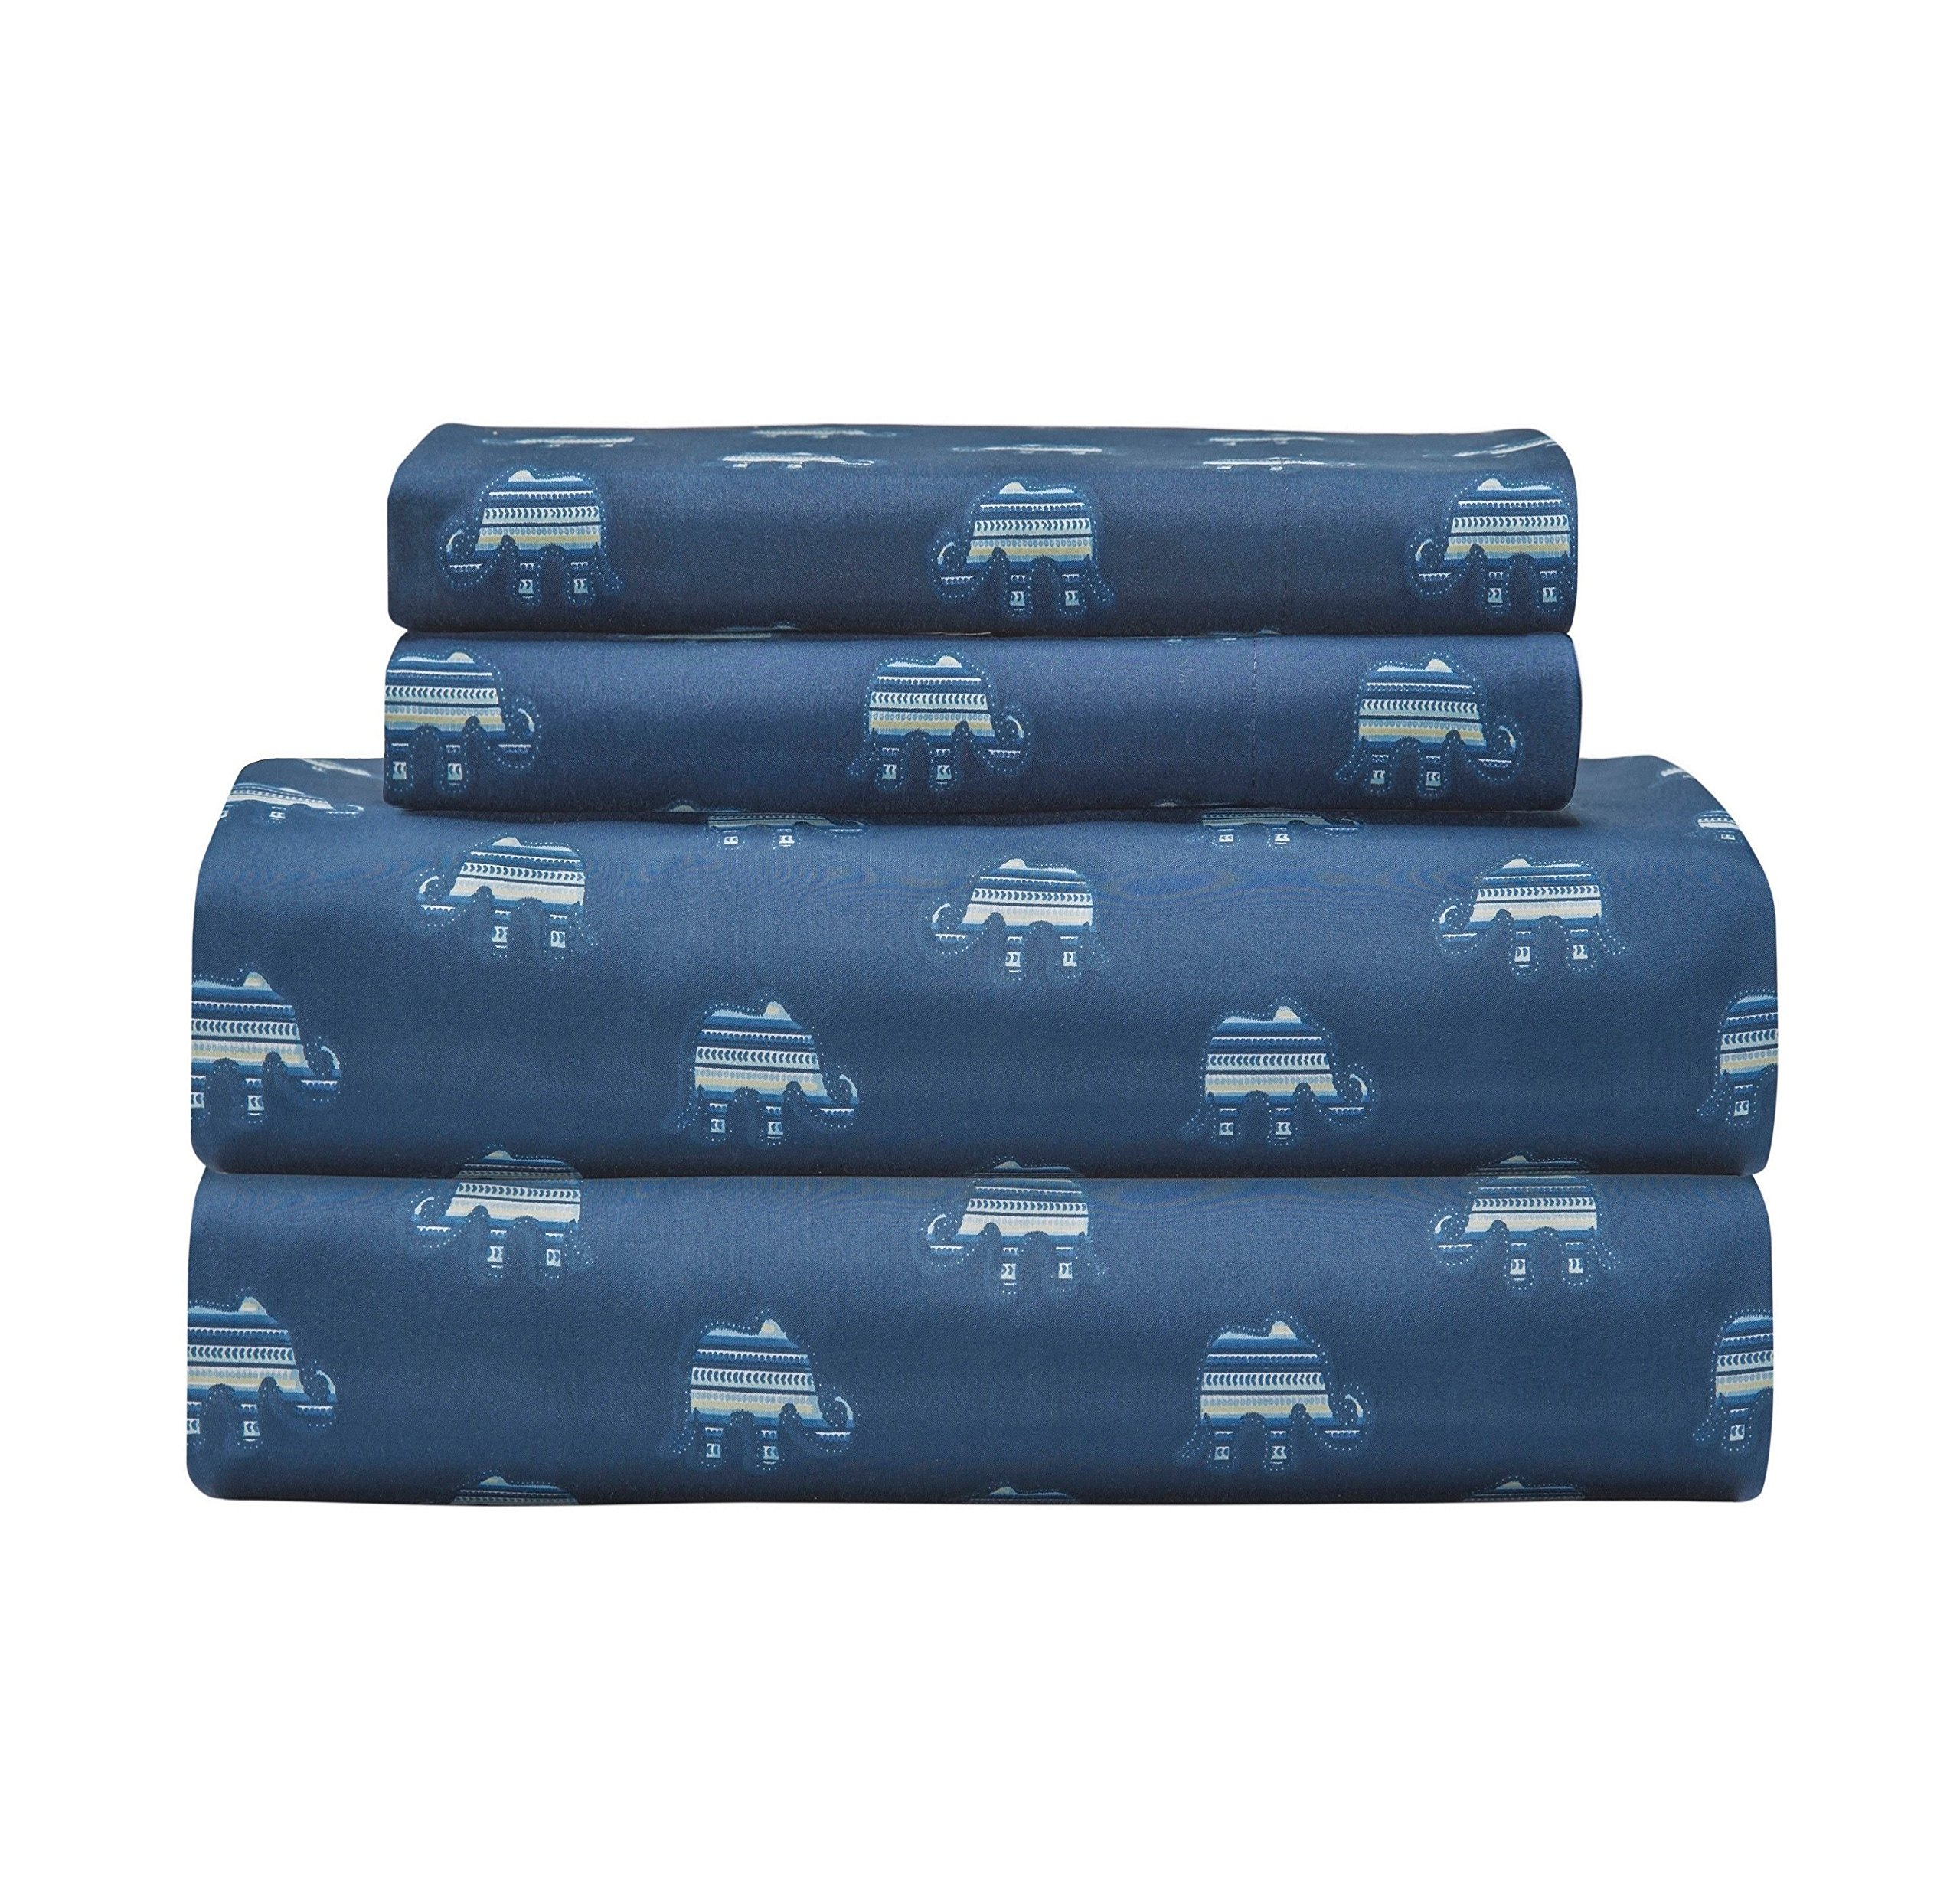 N-A 4 Piece Girls Elephant Indigo Blue Sheet King Set, Dark Blue Color Animal Print Boho Printed Kids Bedding Teen Bedroom, Whimsical Design Contemporary Zoo Jungle Safari, Polyester